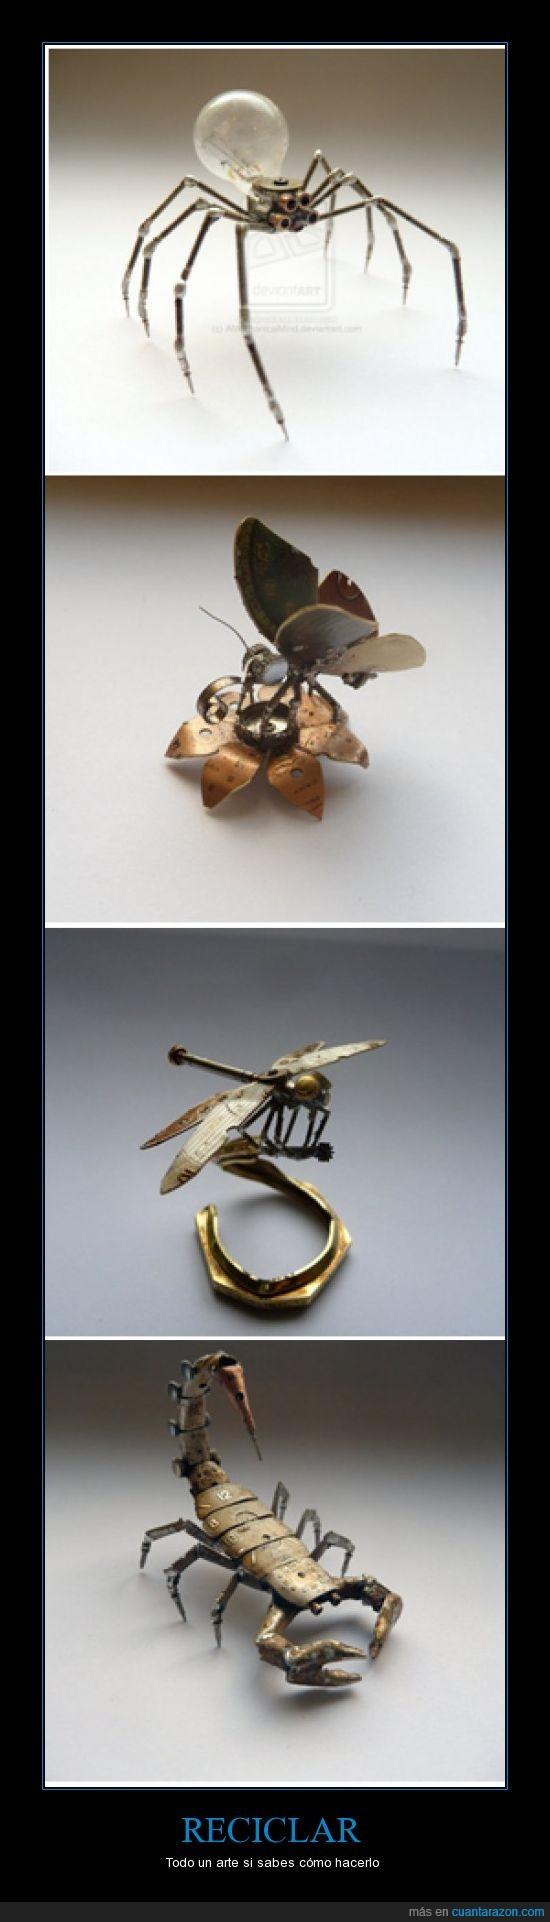 araña,arte,escorpion,libelula,mariposa,Reciclaje